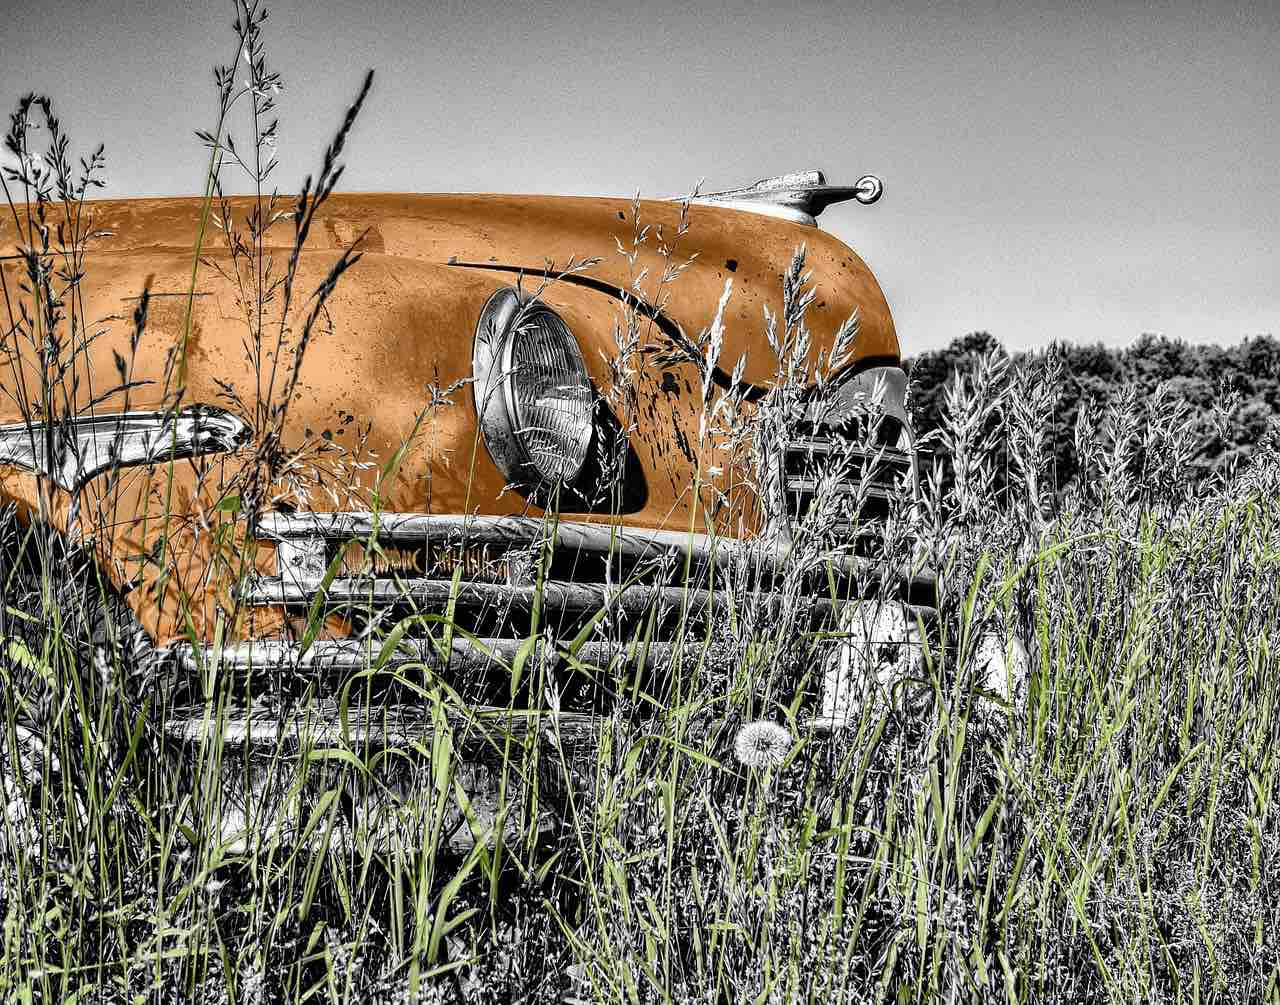 Car Headlights (Pixabay Free Image) - AspirantSG